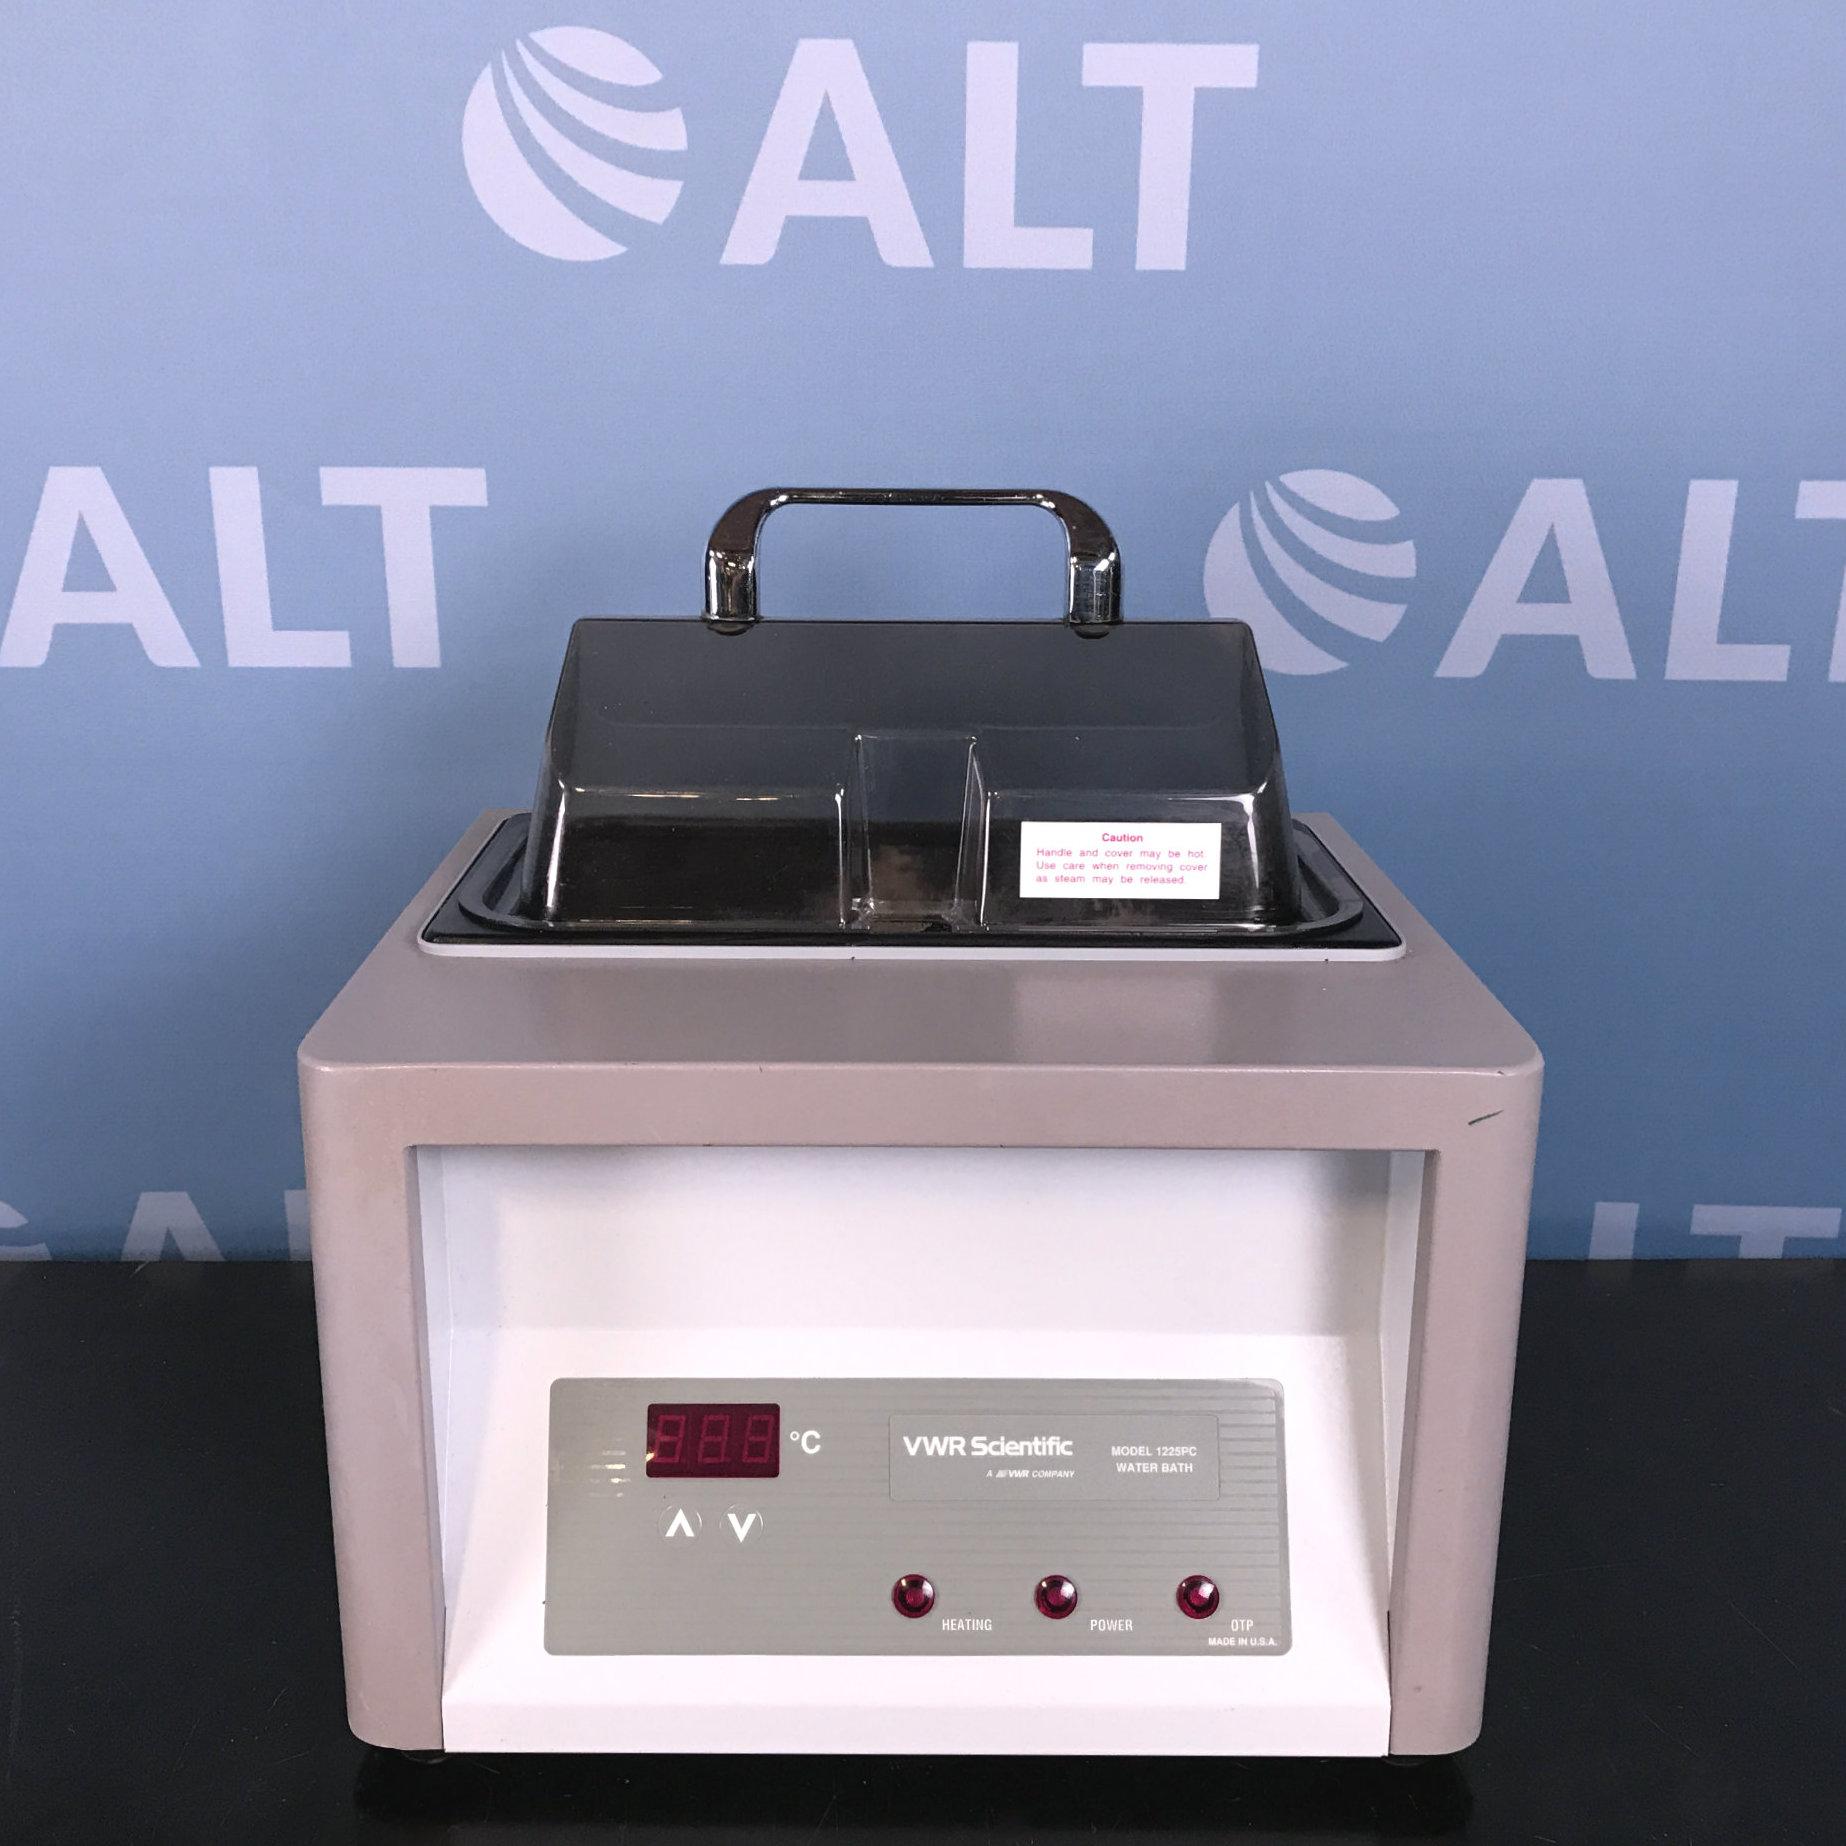 VWR Scientific Model 1225PC Digital Water Bath Image